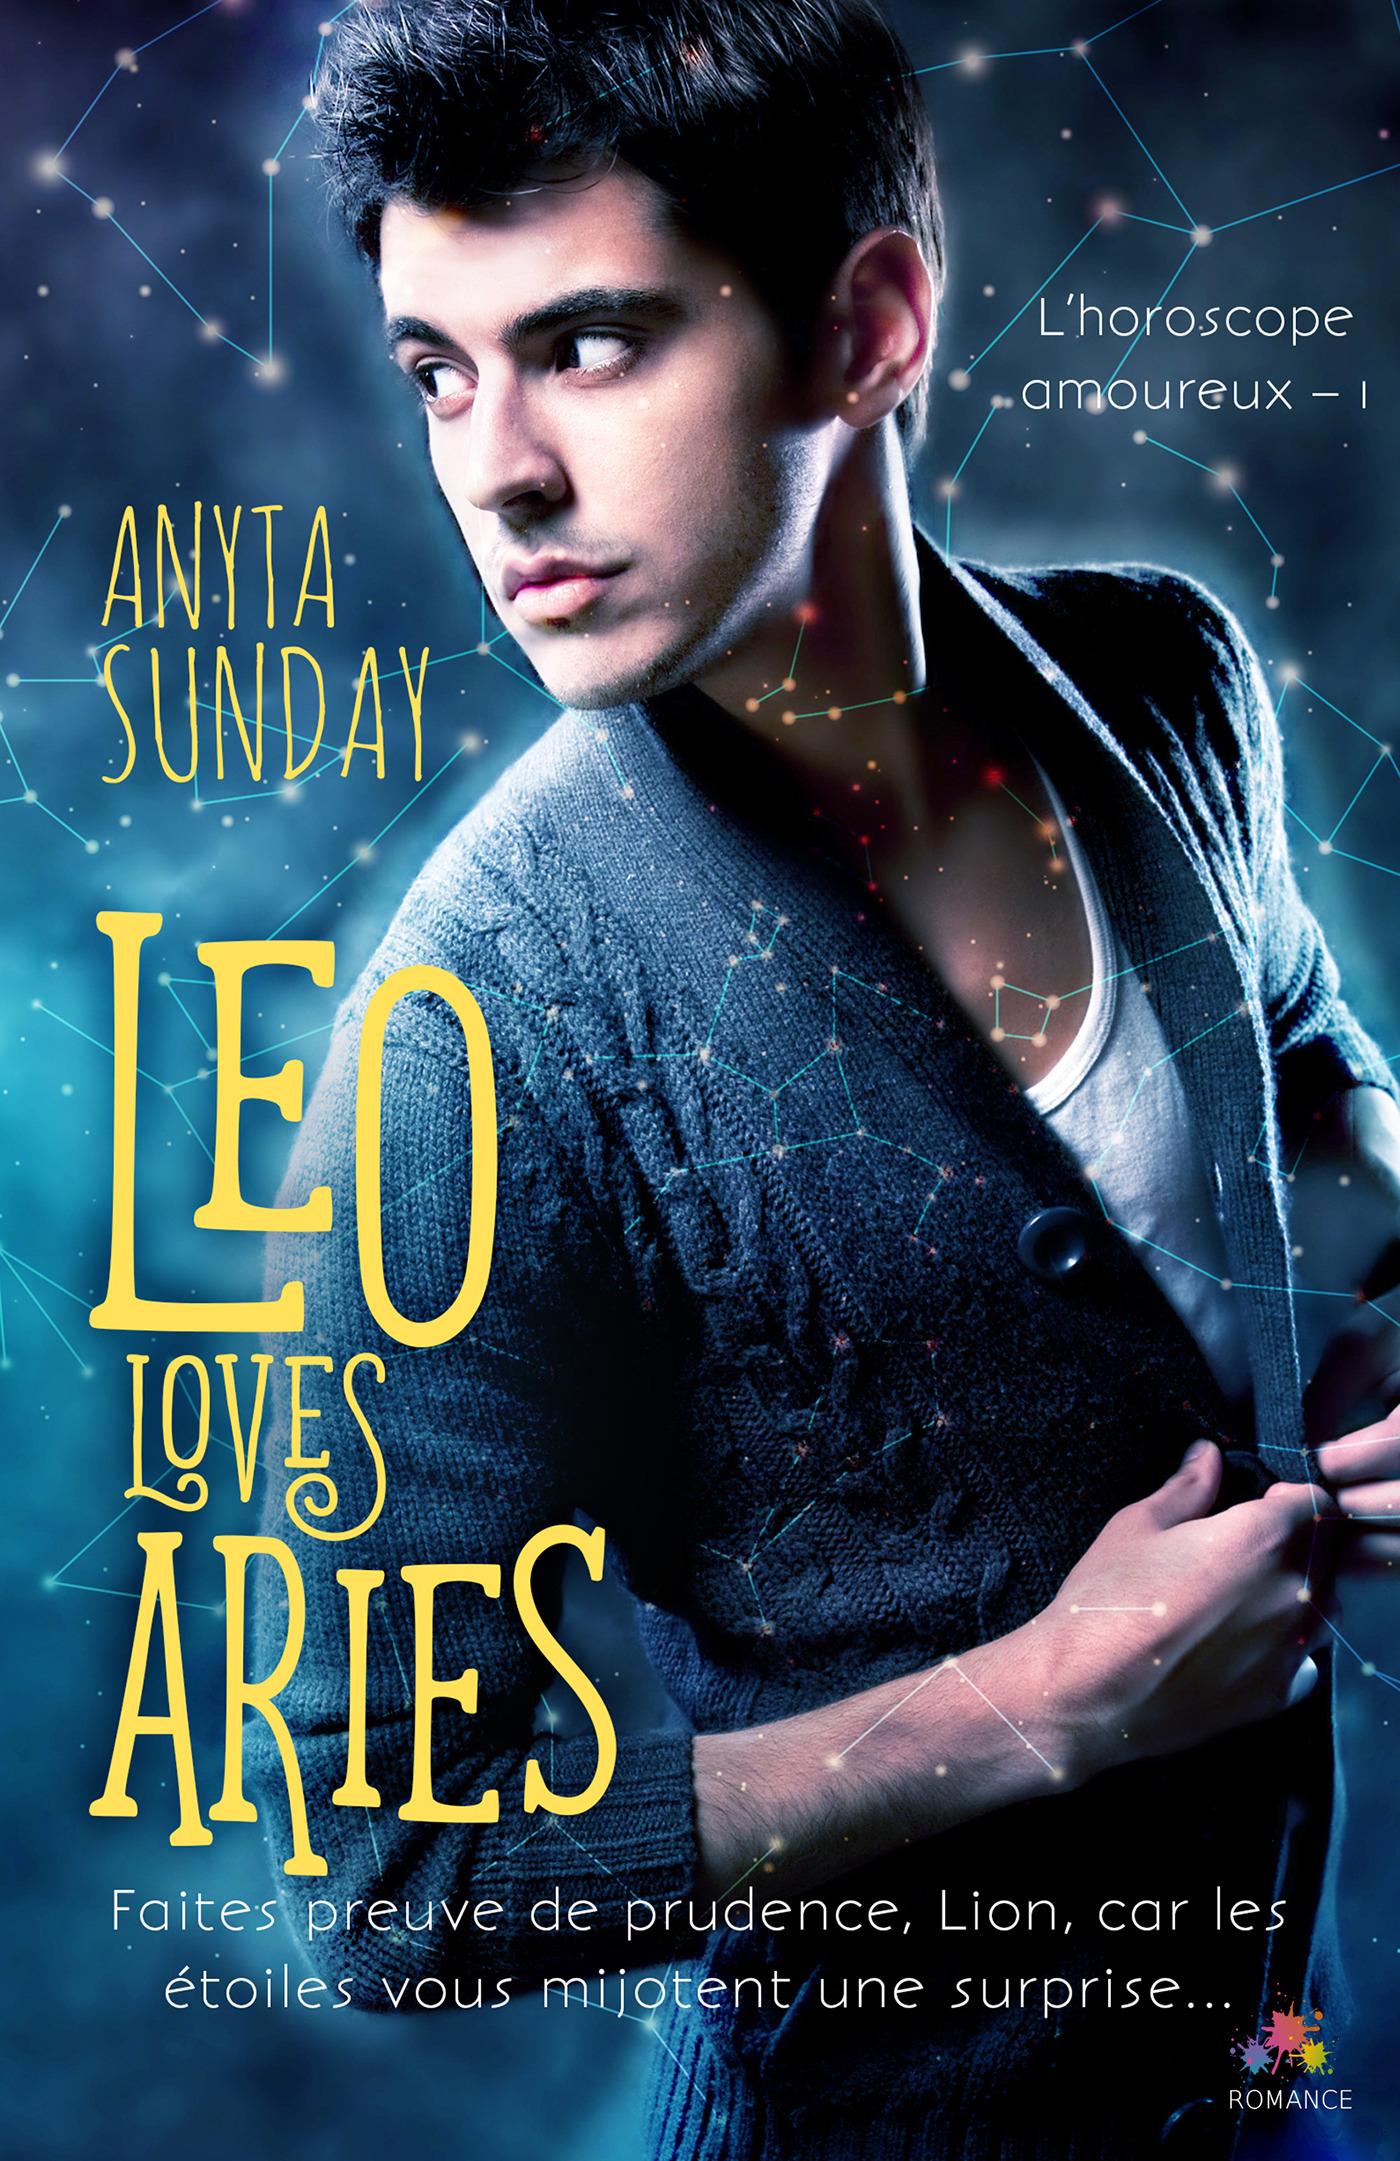 L'horoscope amoureux t.1 ; Leo loves aries